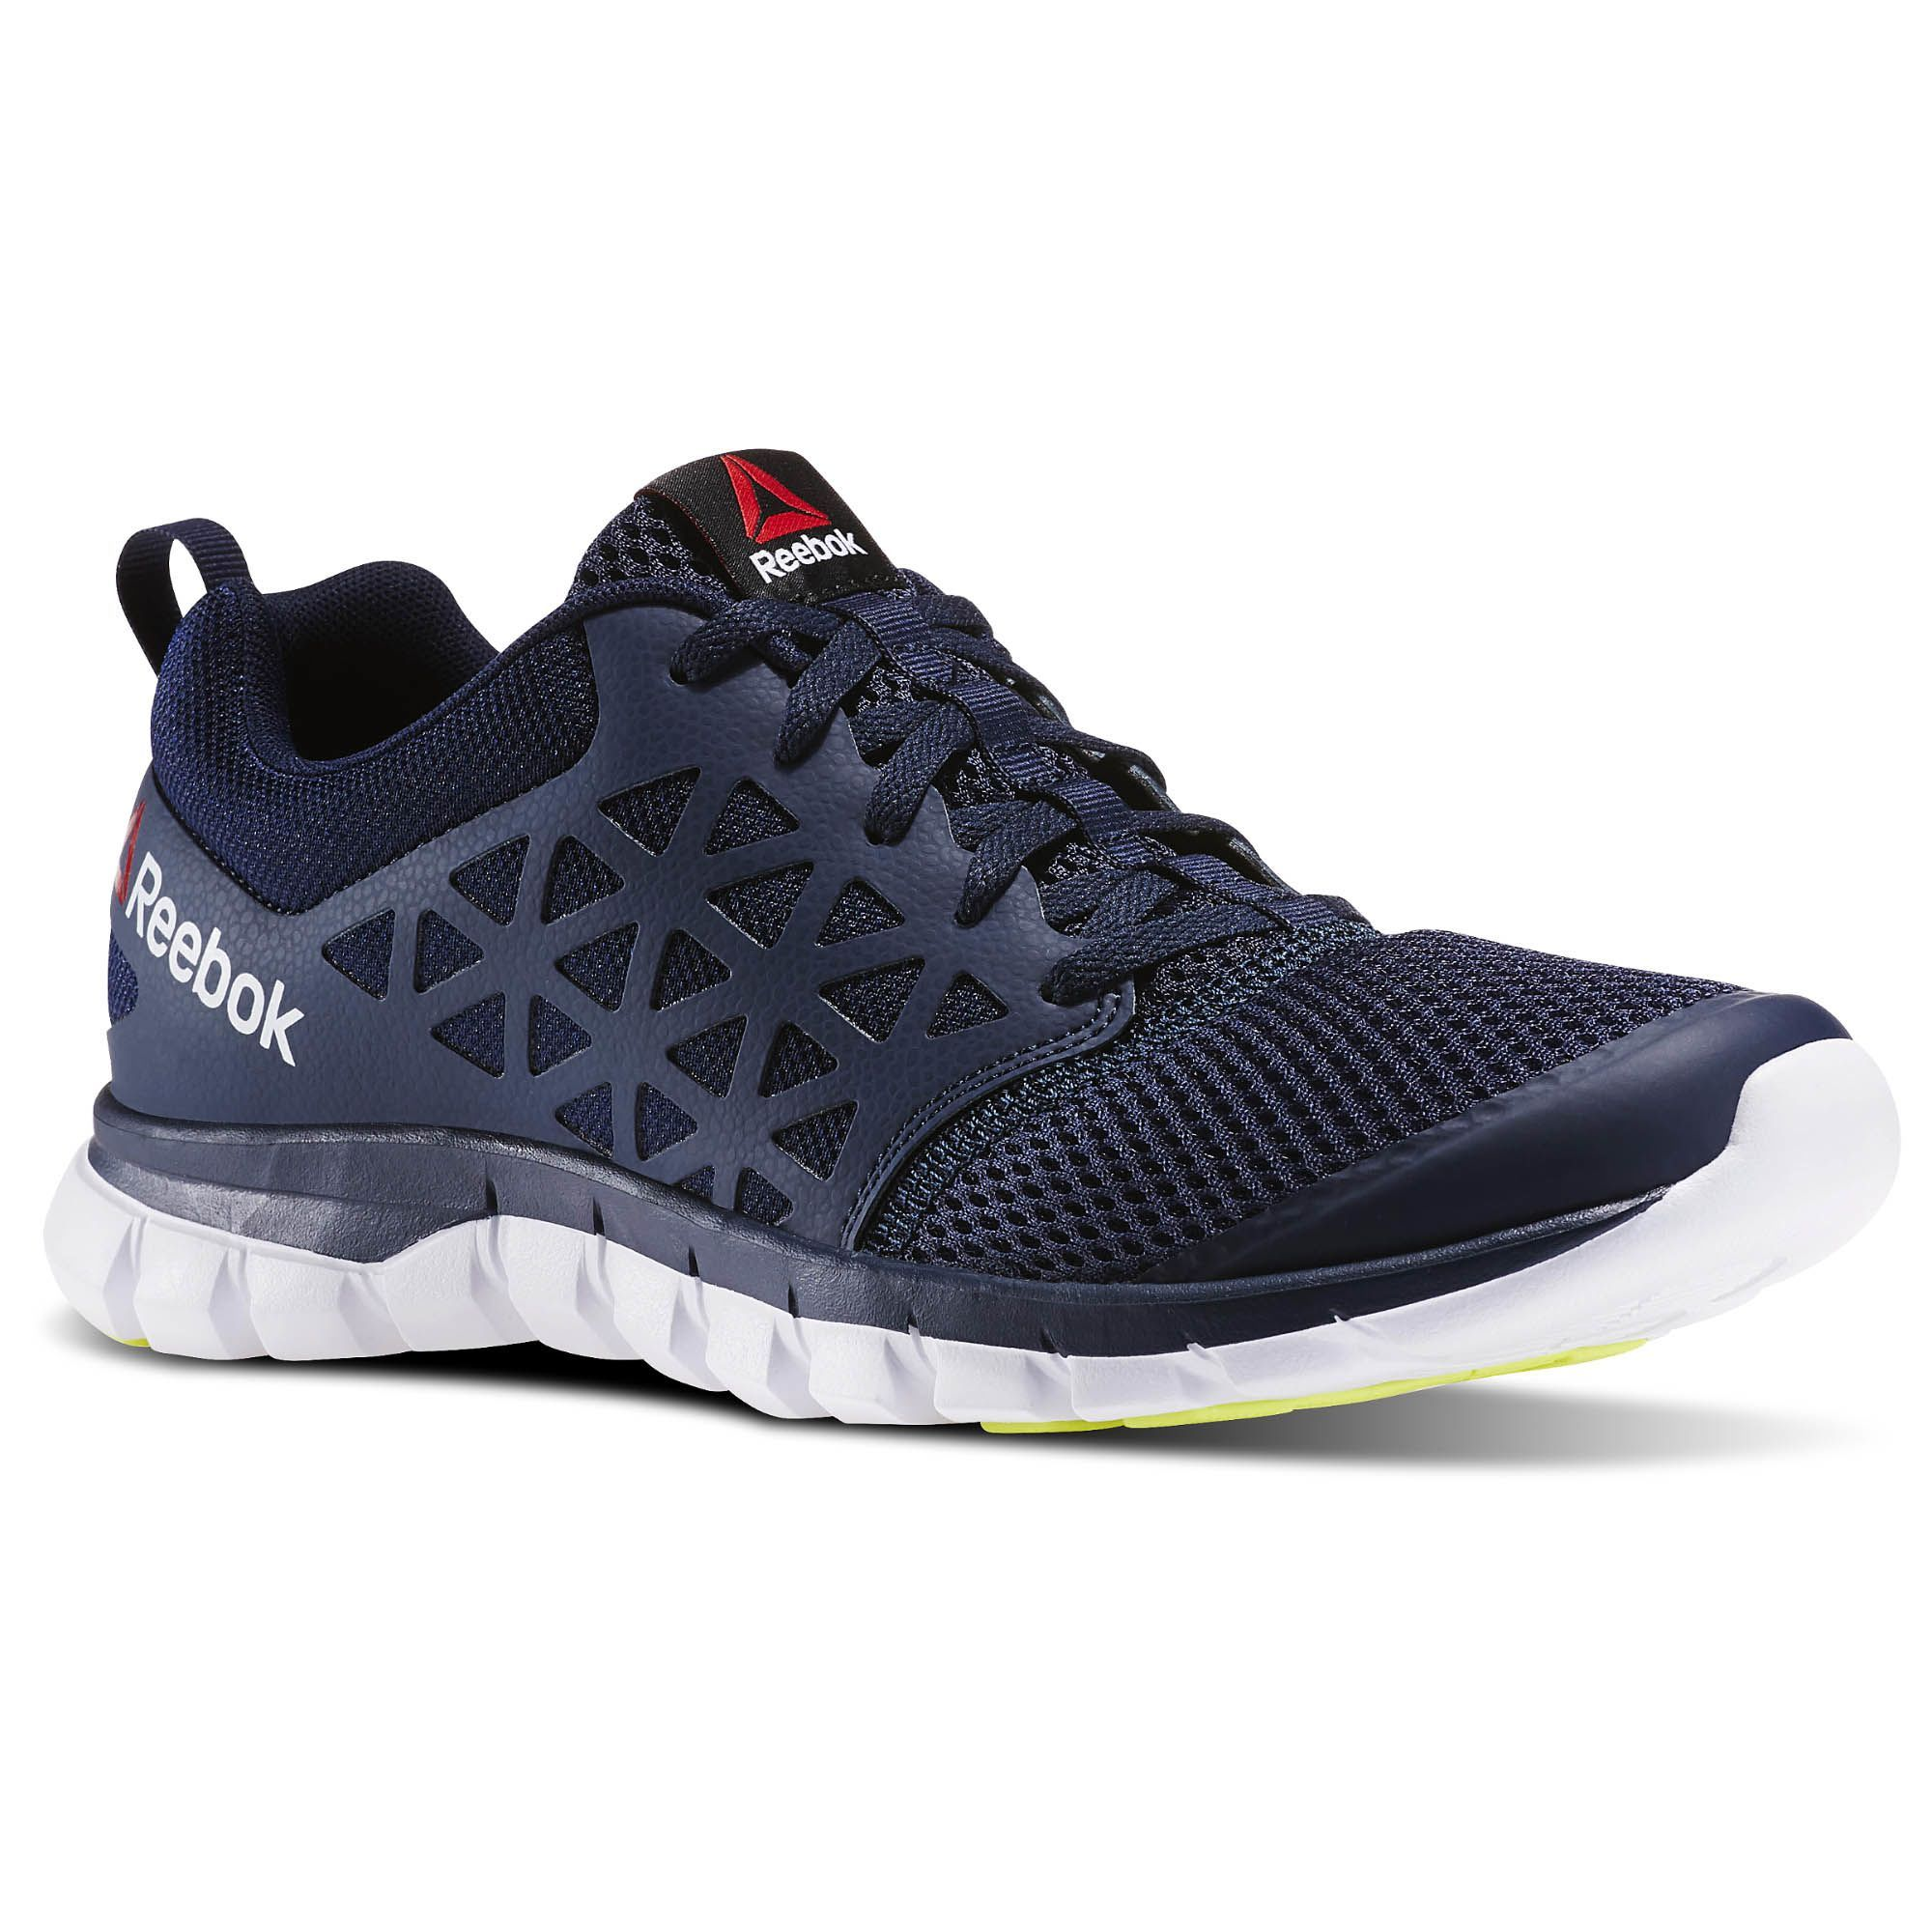 zapatos adidas en marathon sport ecuador oficial zip